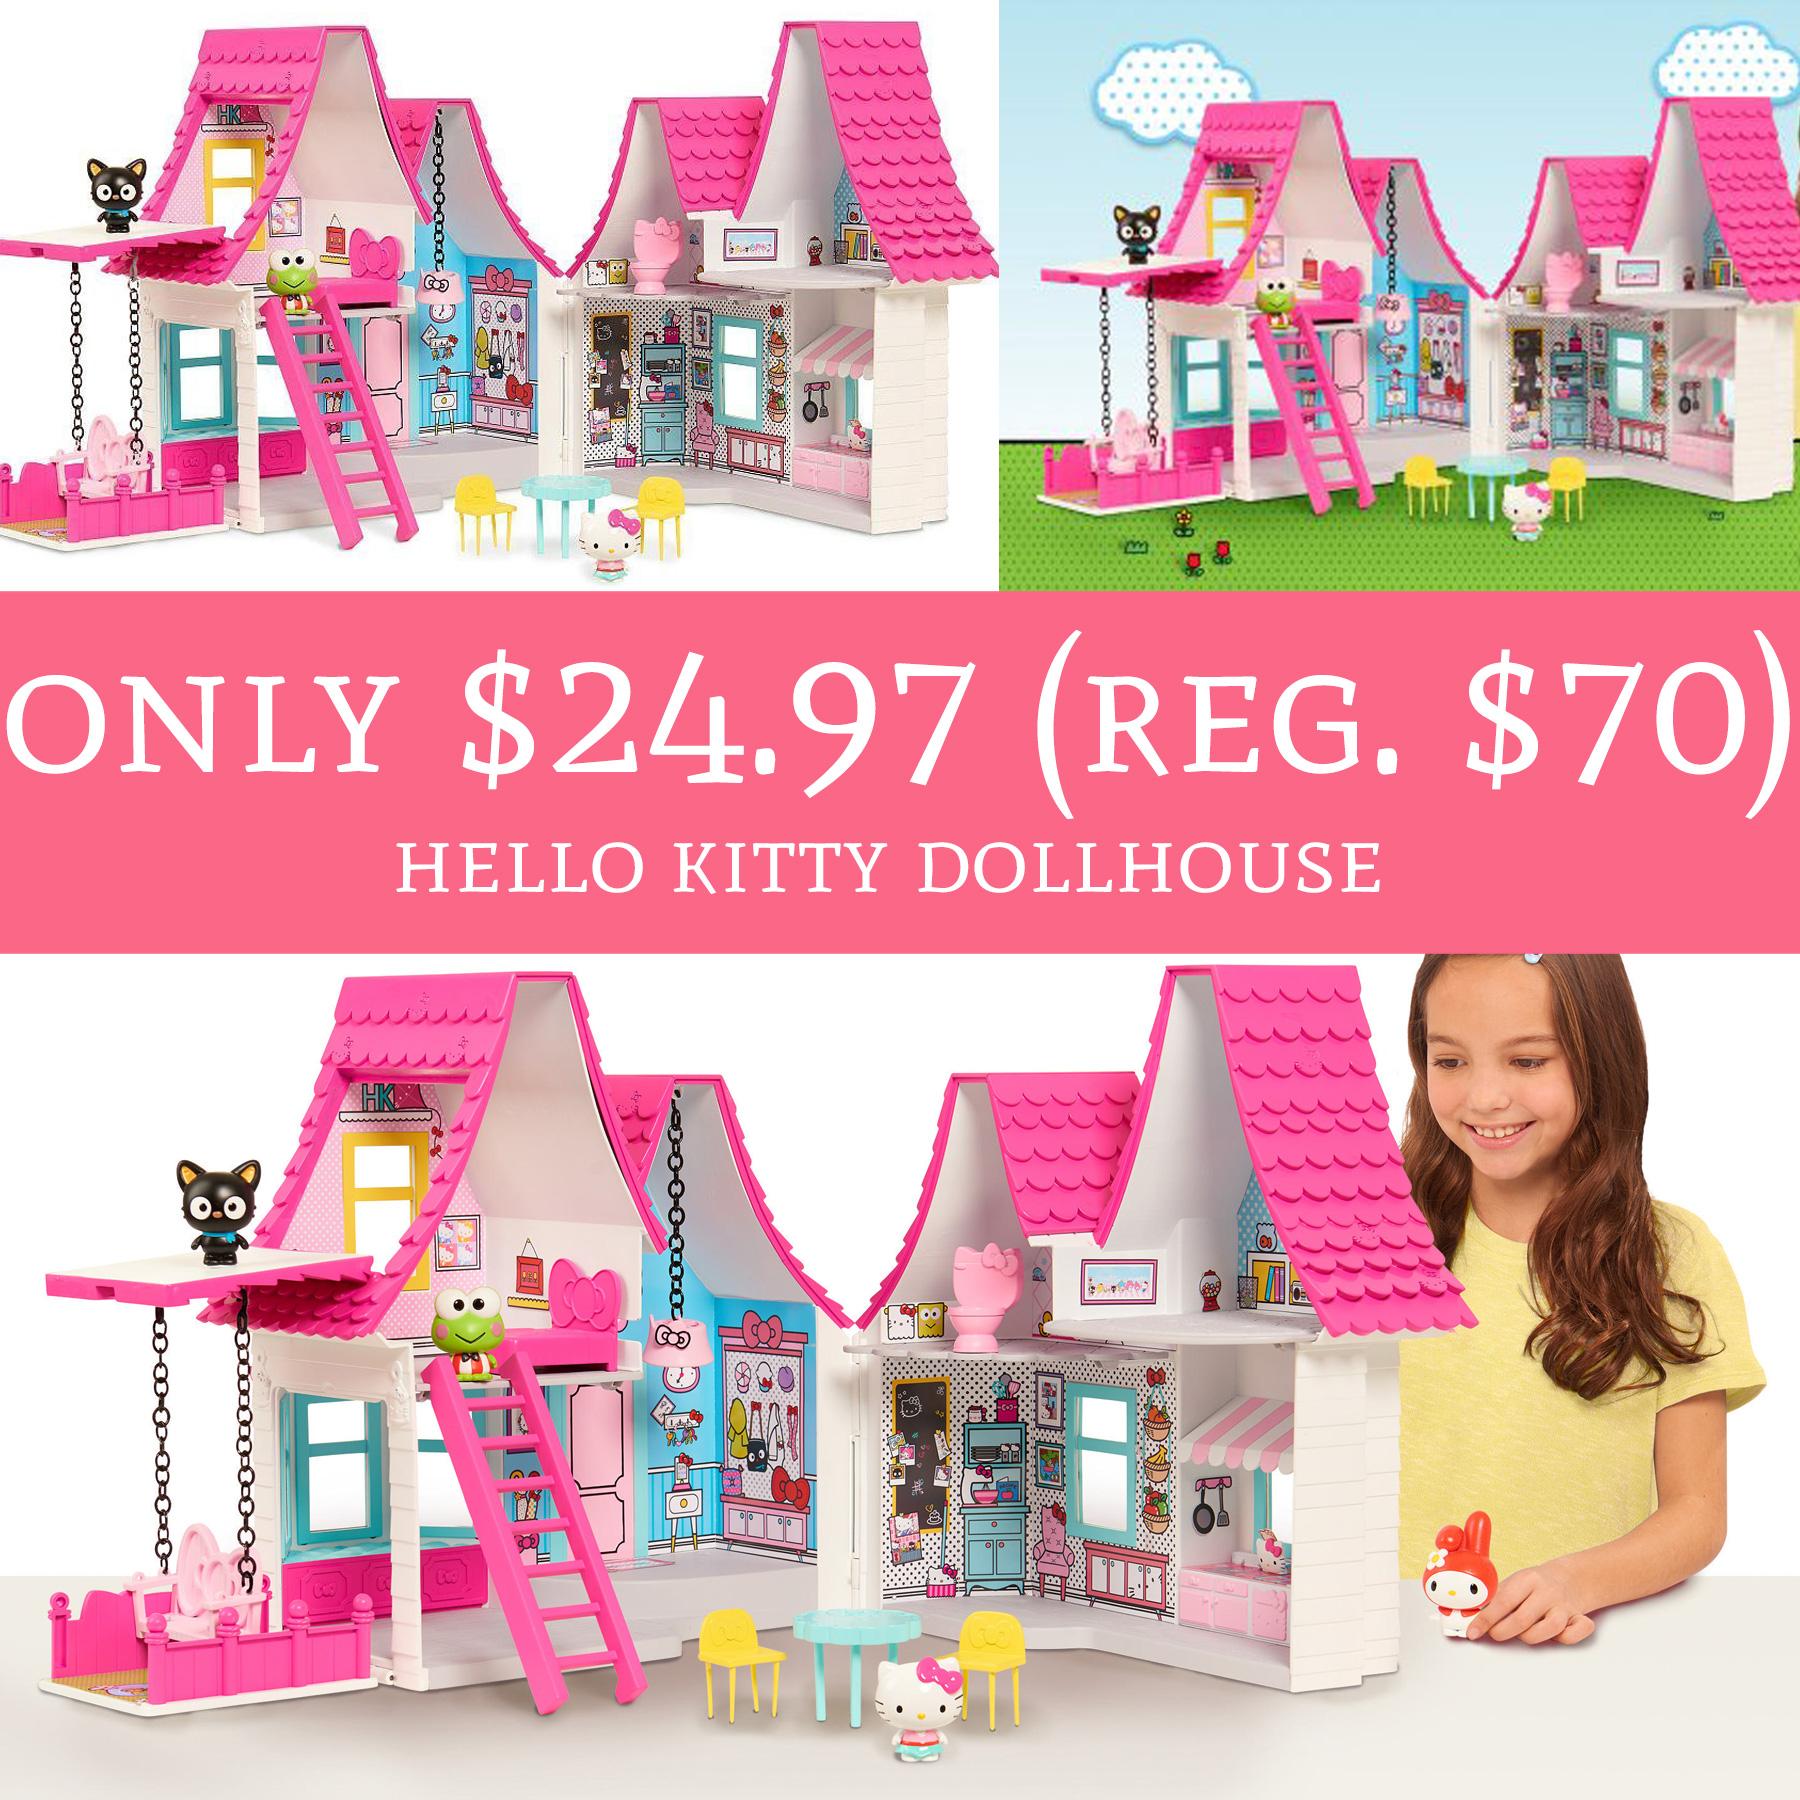 Run Lowest Price Only 24 97 Regular 70 Hello Kitty Dollhouse